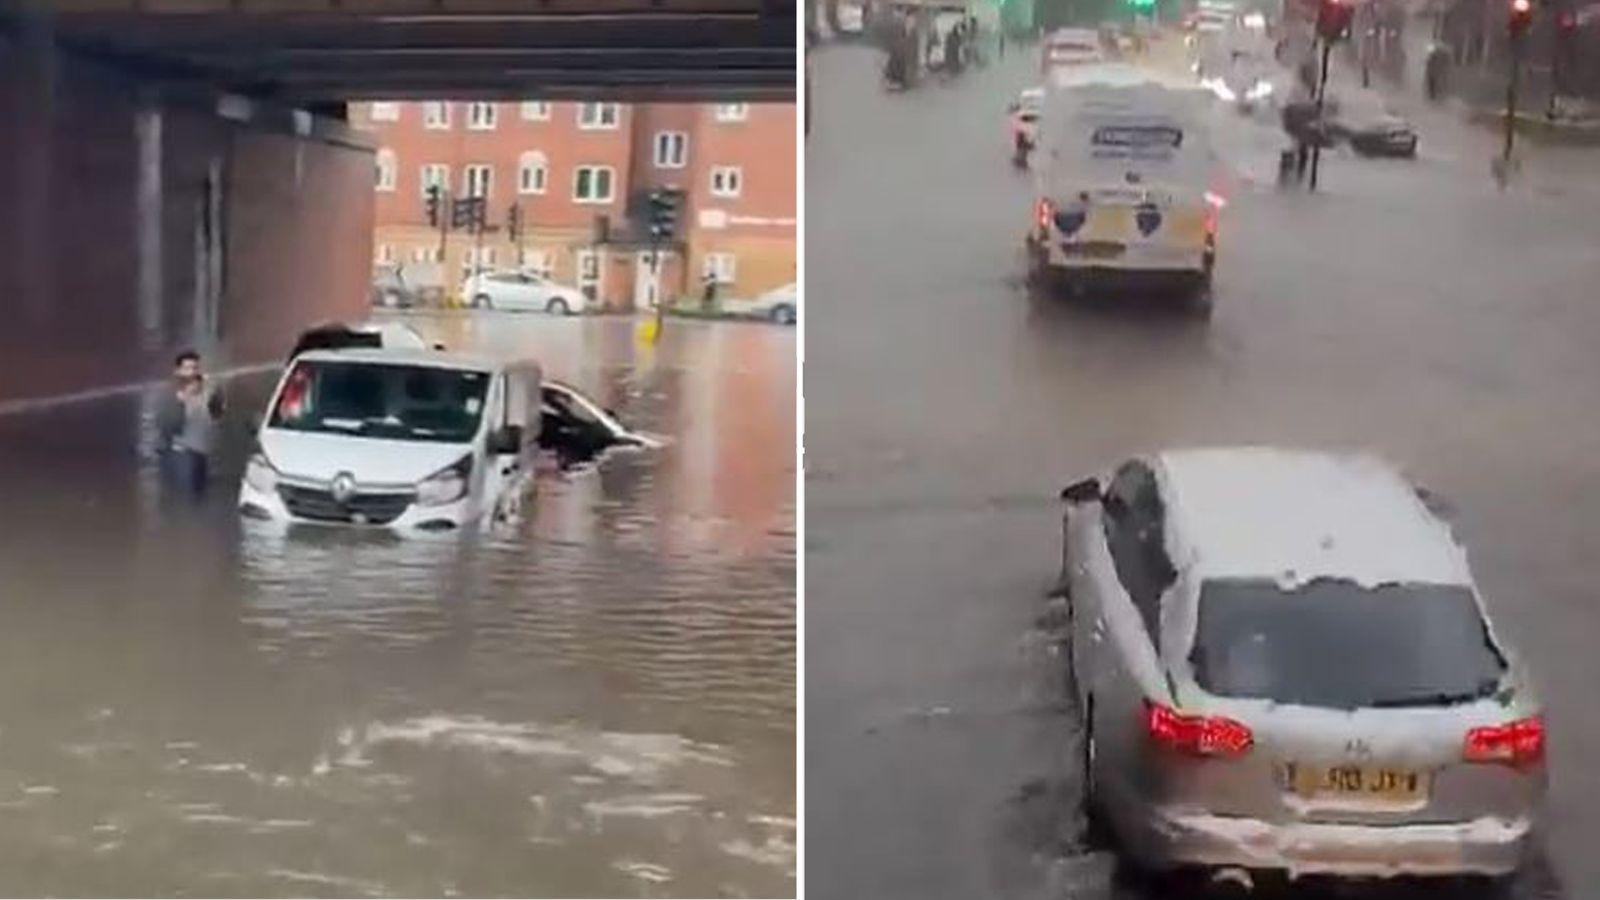 london flooding - photo #3